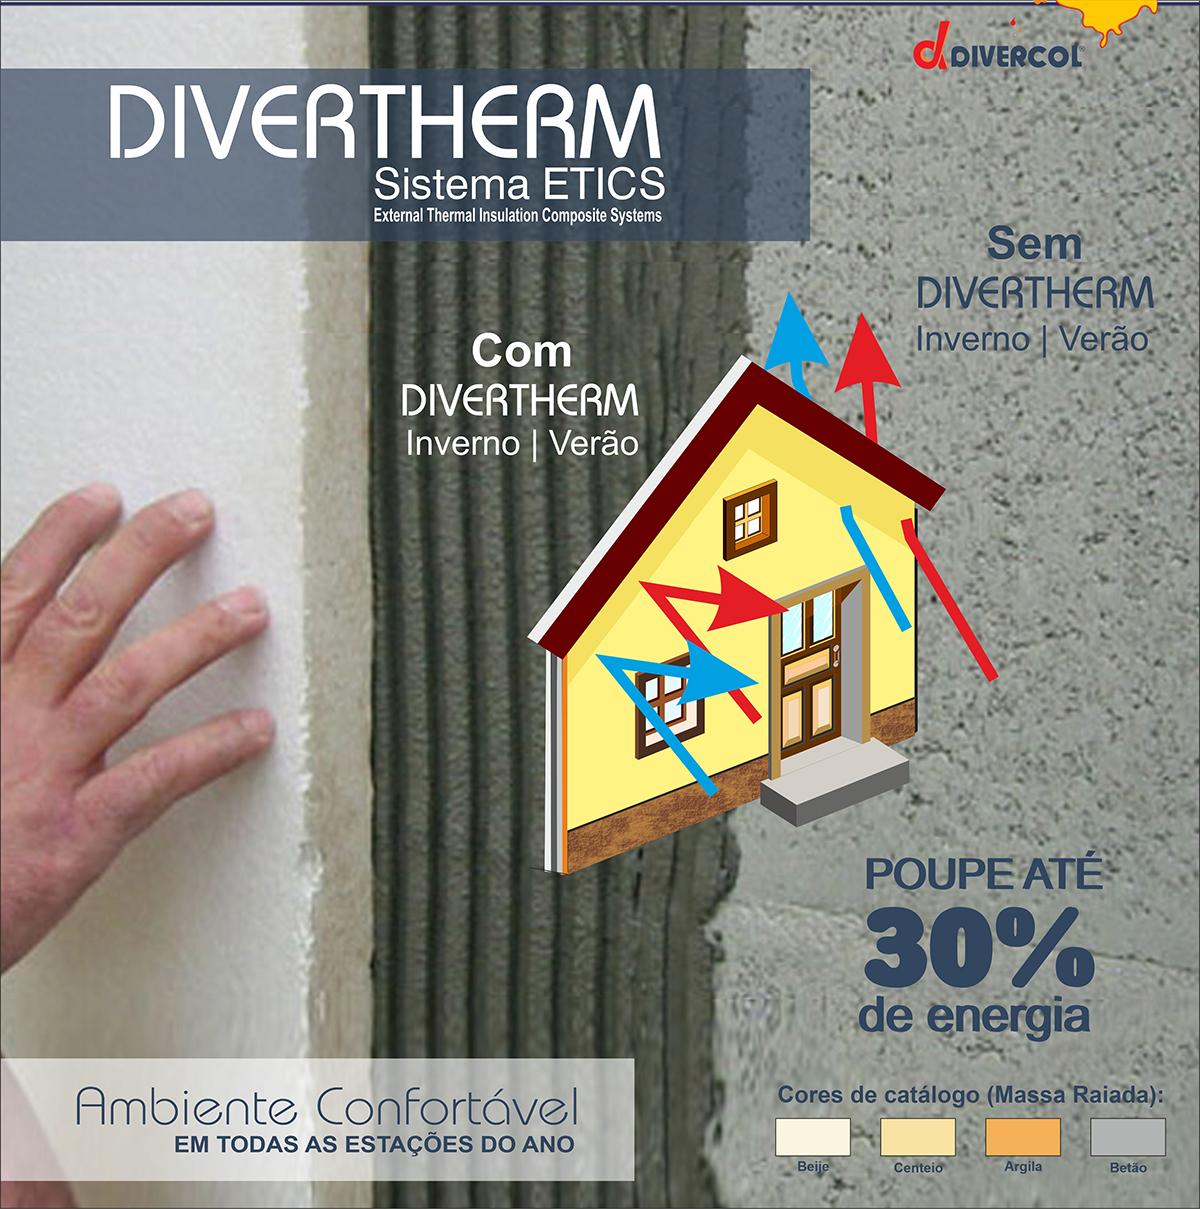 Sistema ETICS Divertherm